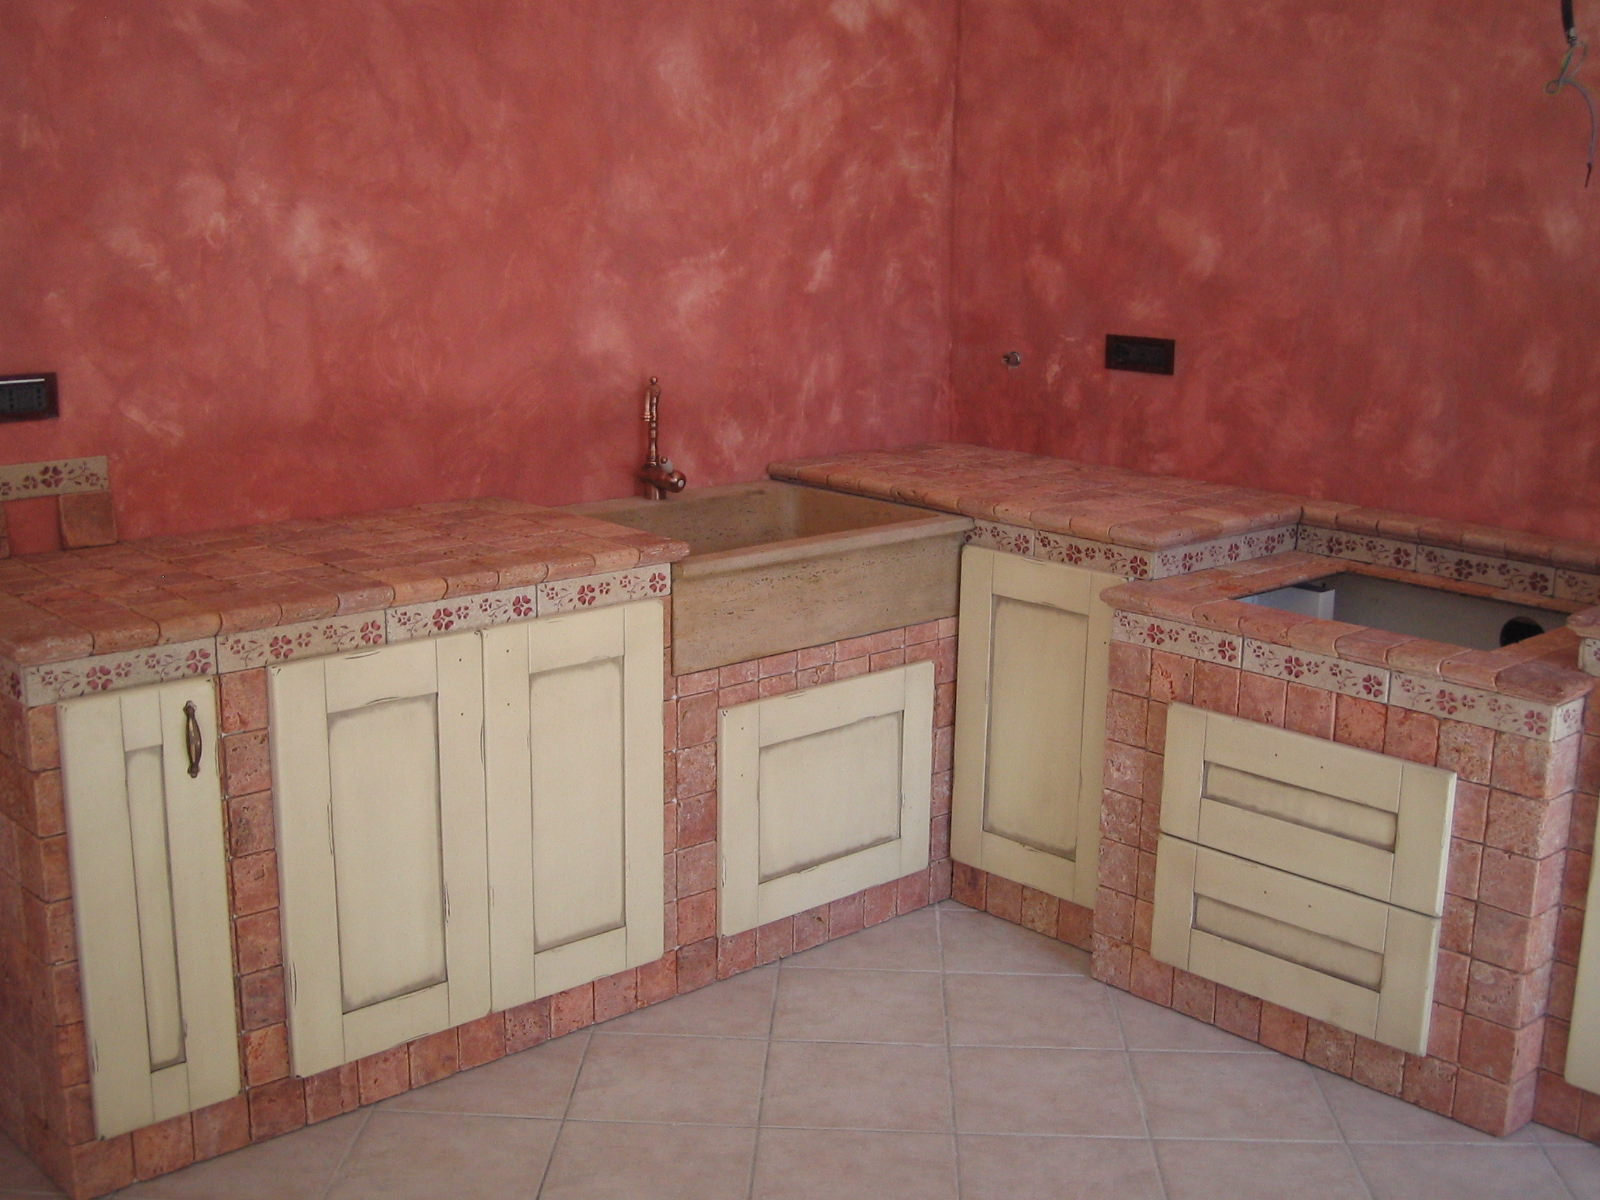 Progettare cucina in muratura cucine with progettare - Progettare cucina in muratura ...